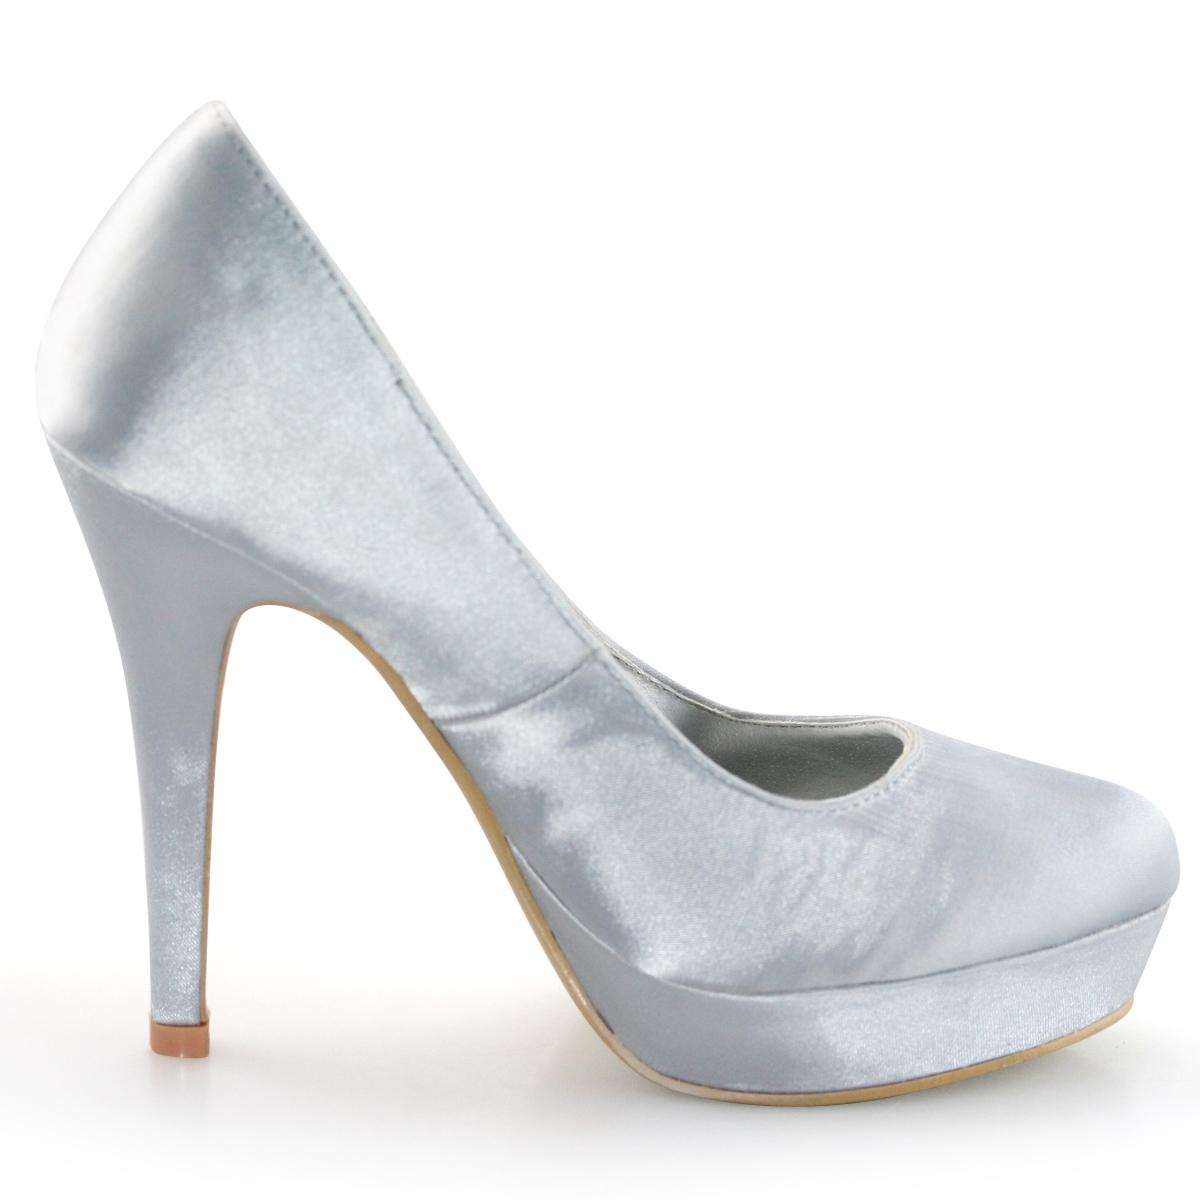 SHOEZY-Womens-Silver-Diamante-Platform-Wedding-Prom-Dress-High-Heels